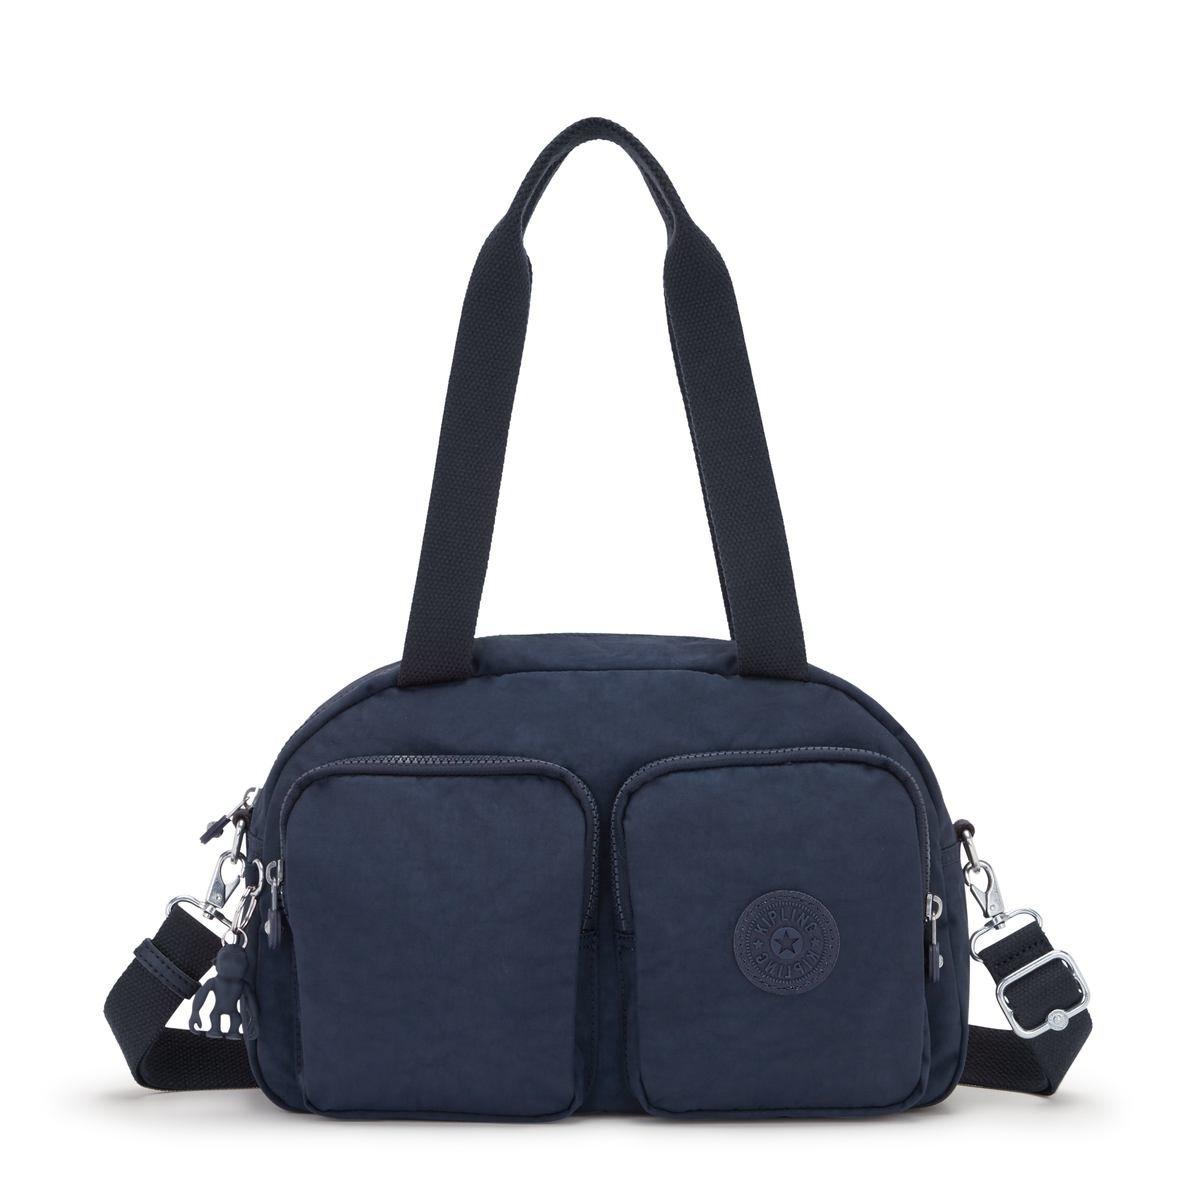 Kipling Τσάντα Ώμου Cool Defea 33x22x12.5cm Blue